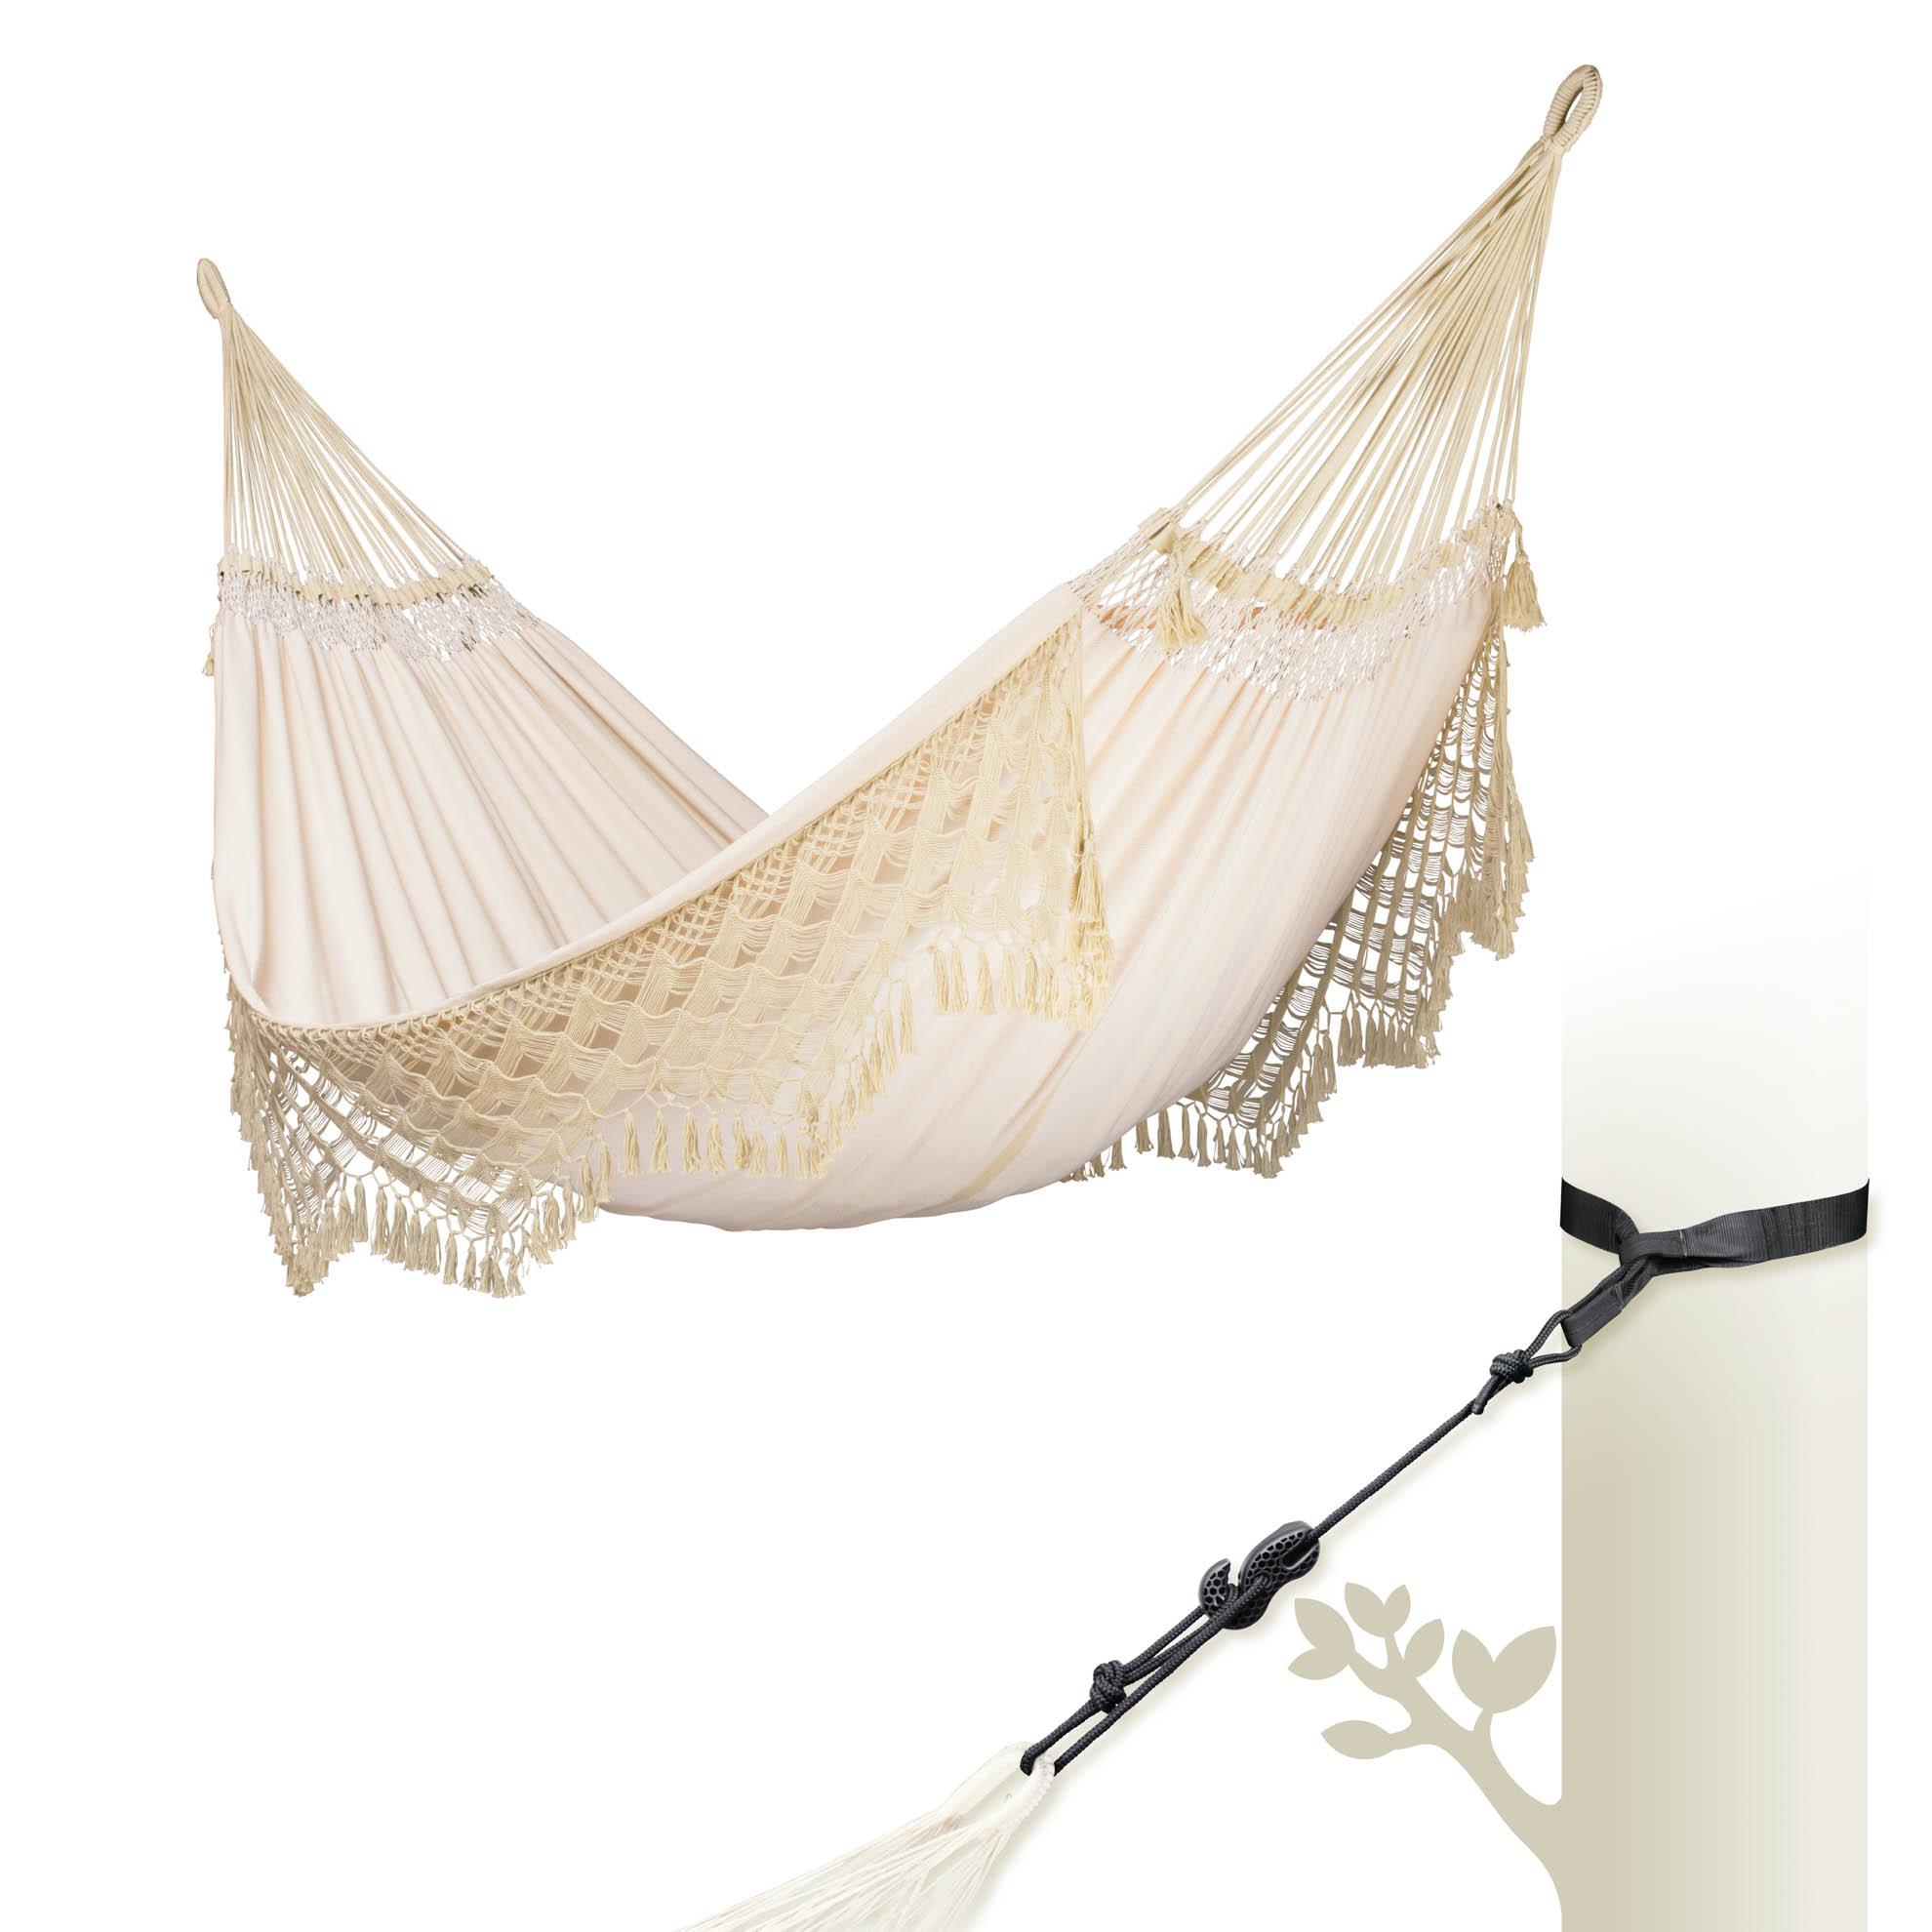 Indoor Luxus Hängematte La Siesta Bossanova